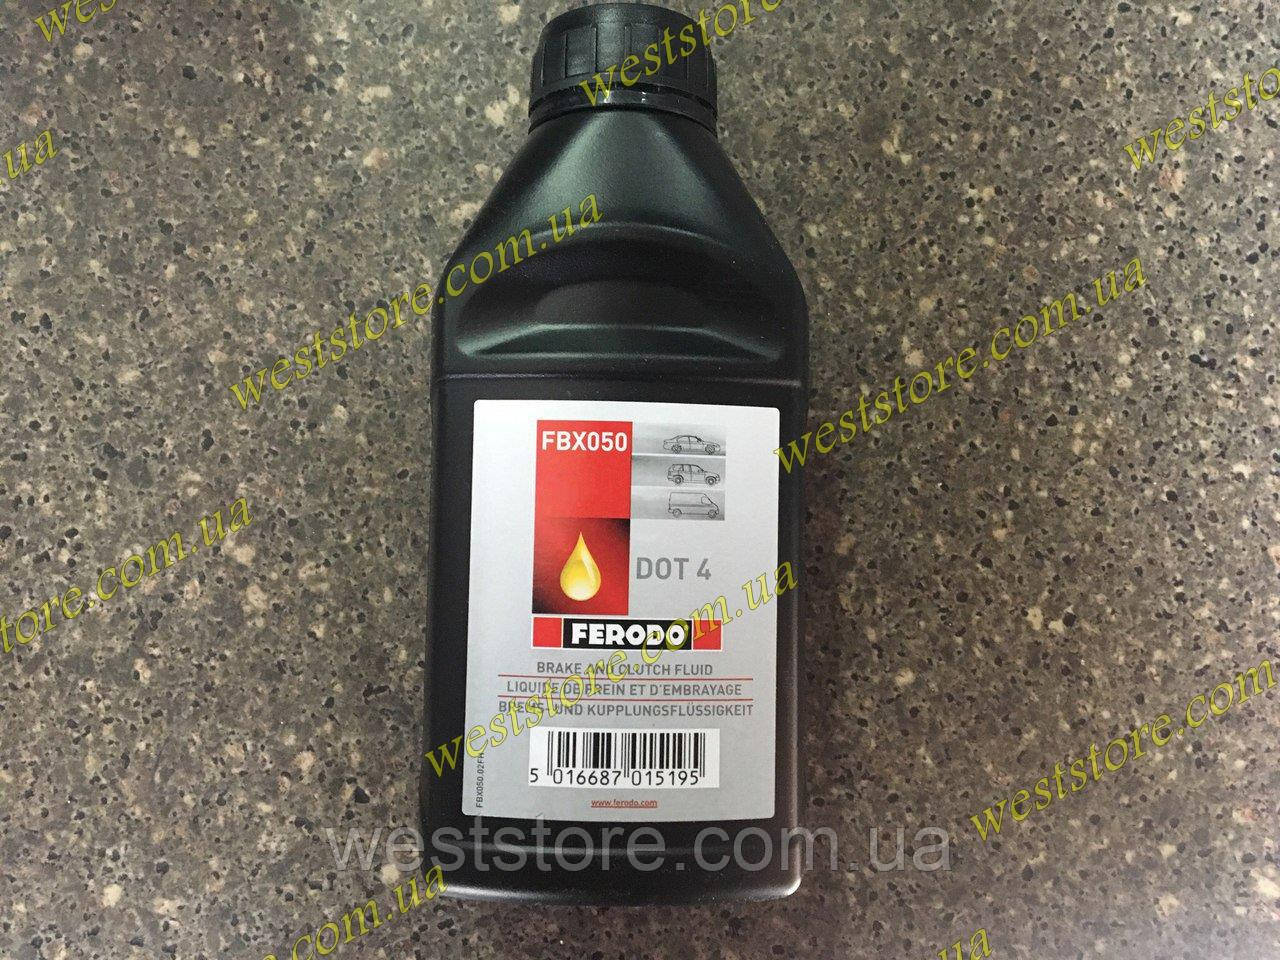 Тормозная жидкость FERODO DOT-4  0.25L  FE FBX025